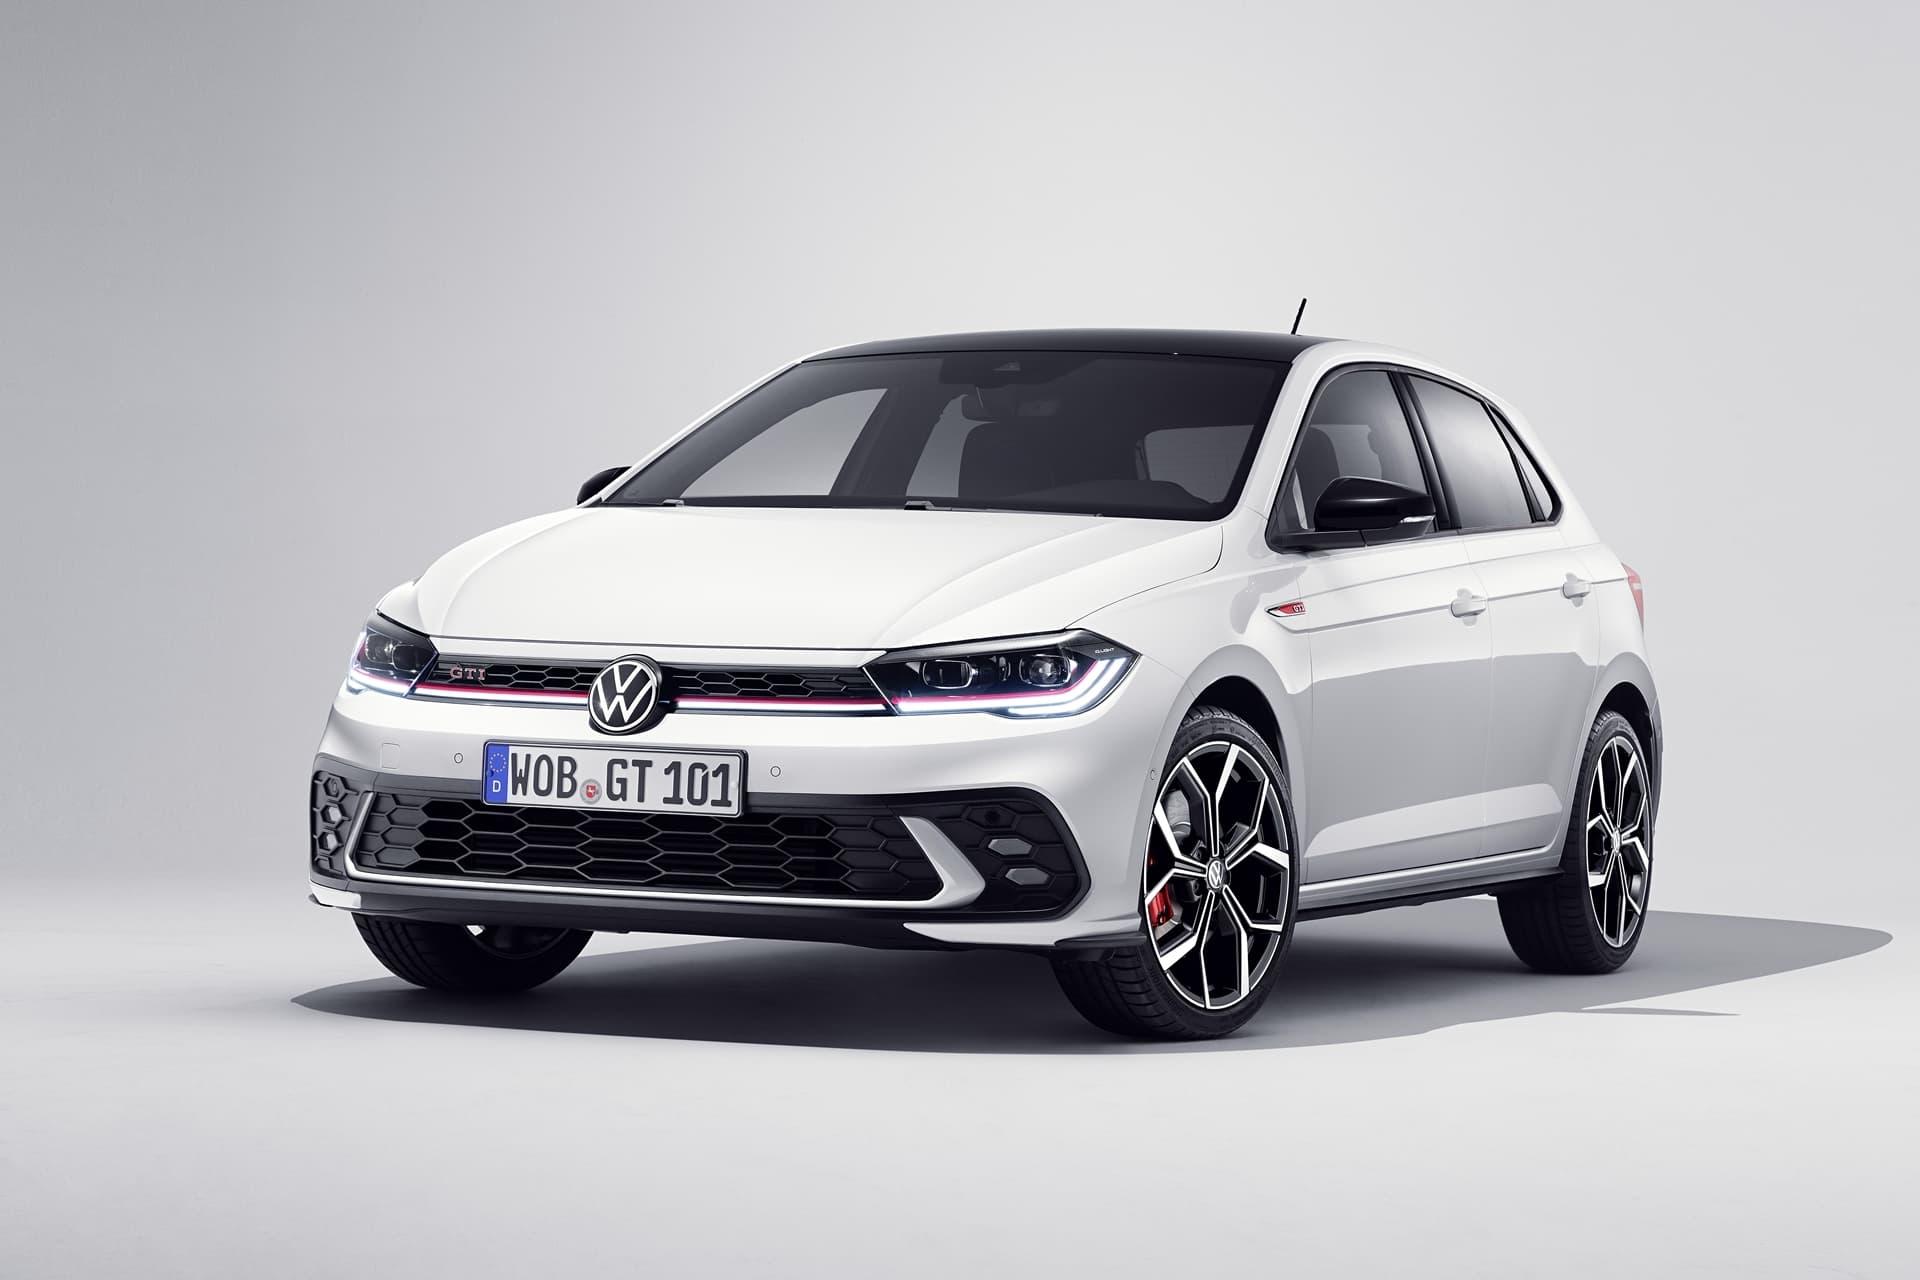 Volkswagen Polo Gti 2022 0621 014